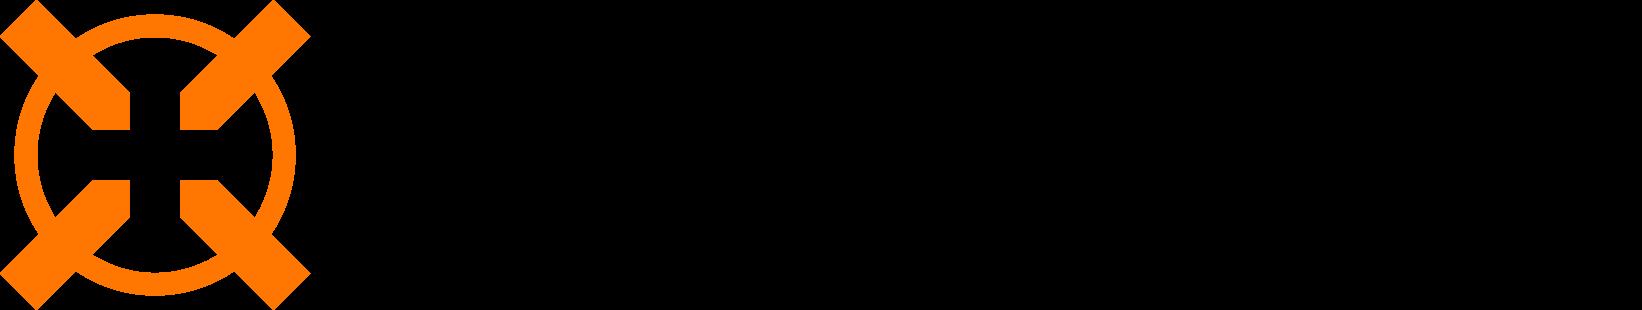 Hitmarker secondary orange and black logo